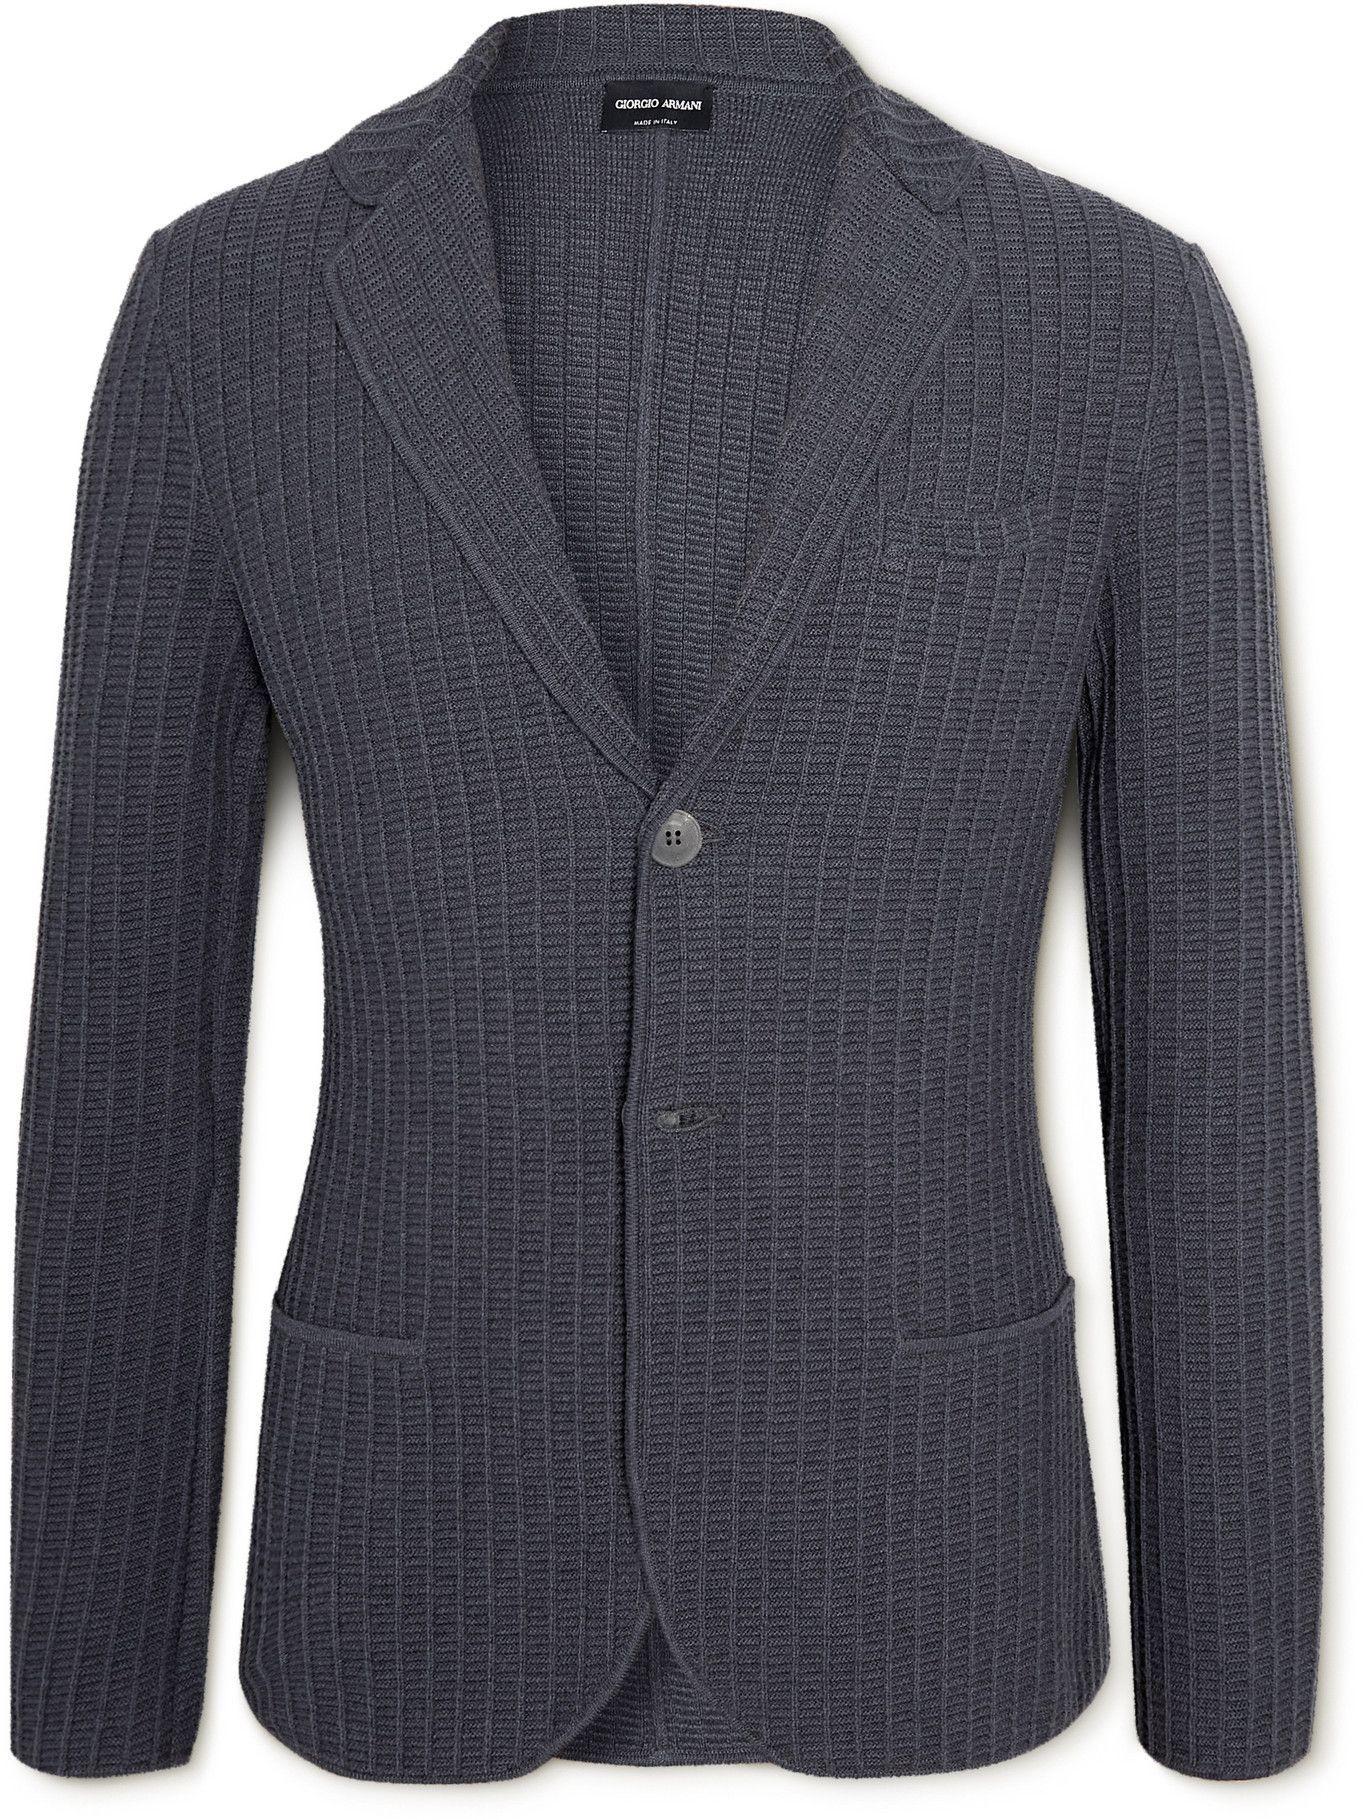 GIORGIO ARMANI - Ribbed Cotton and Wool-Blend Blazer - Blue